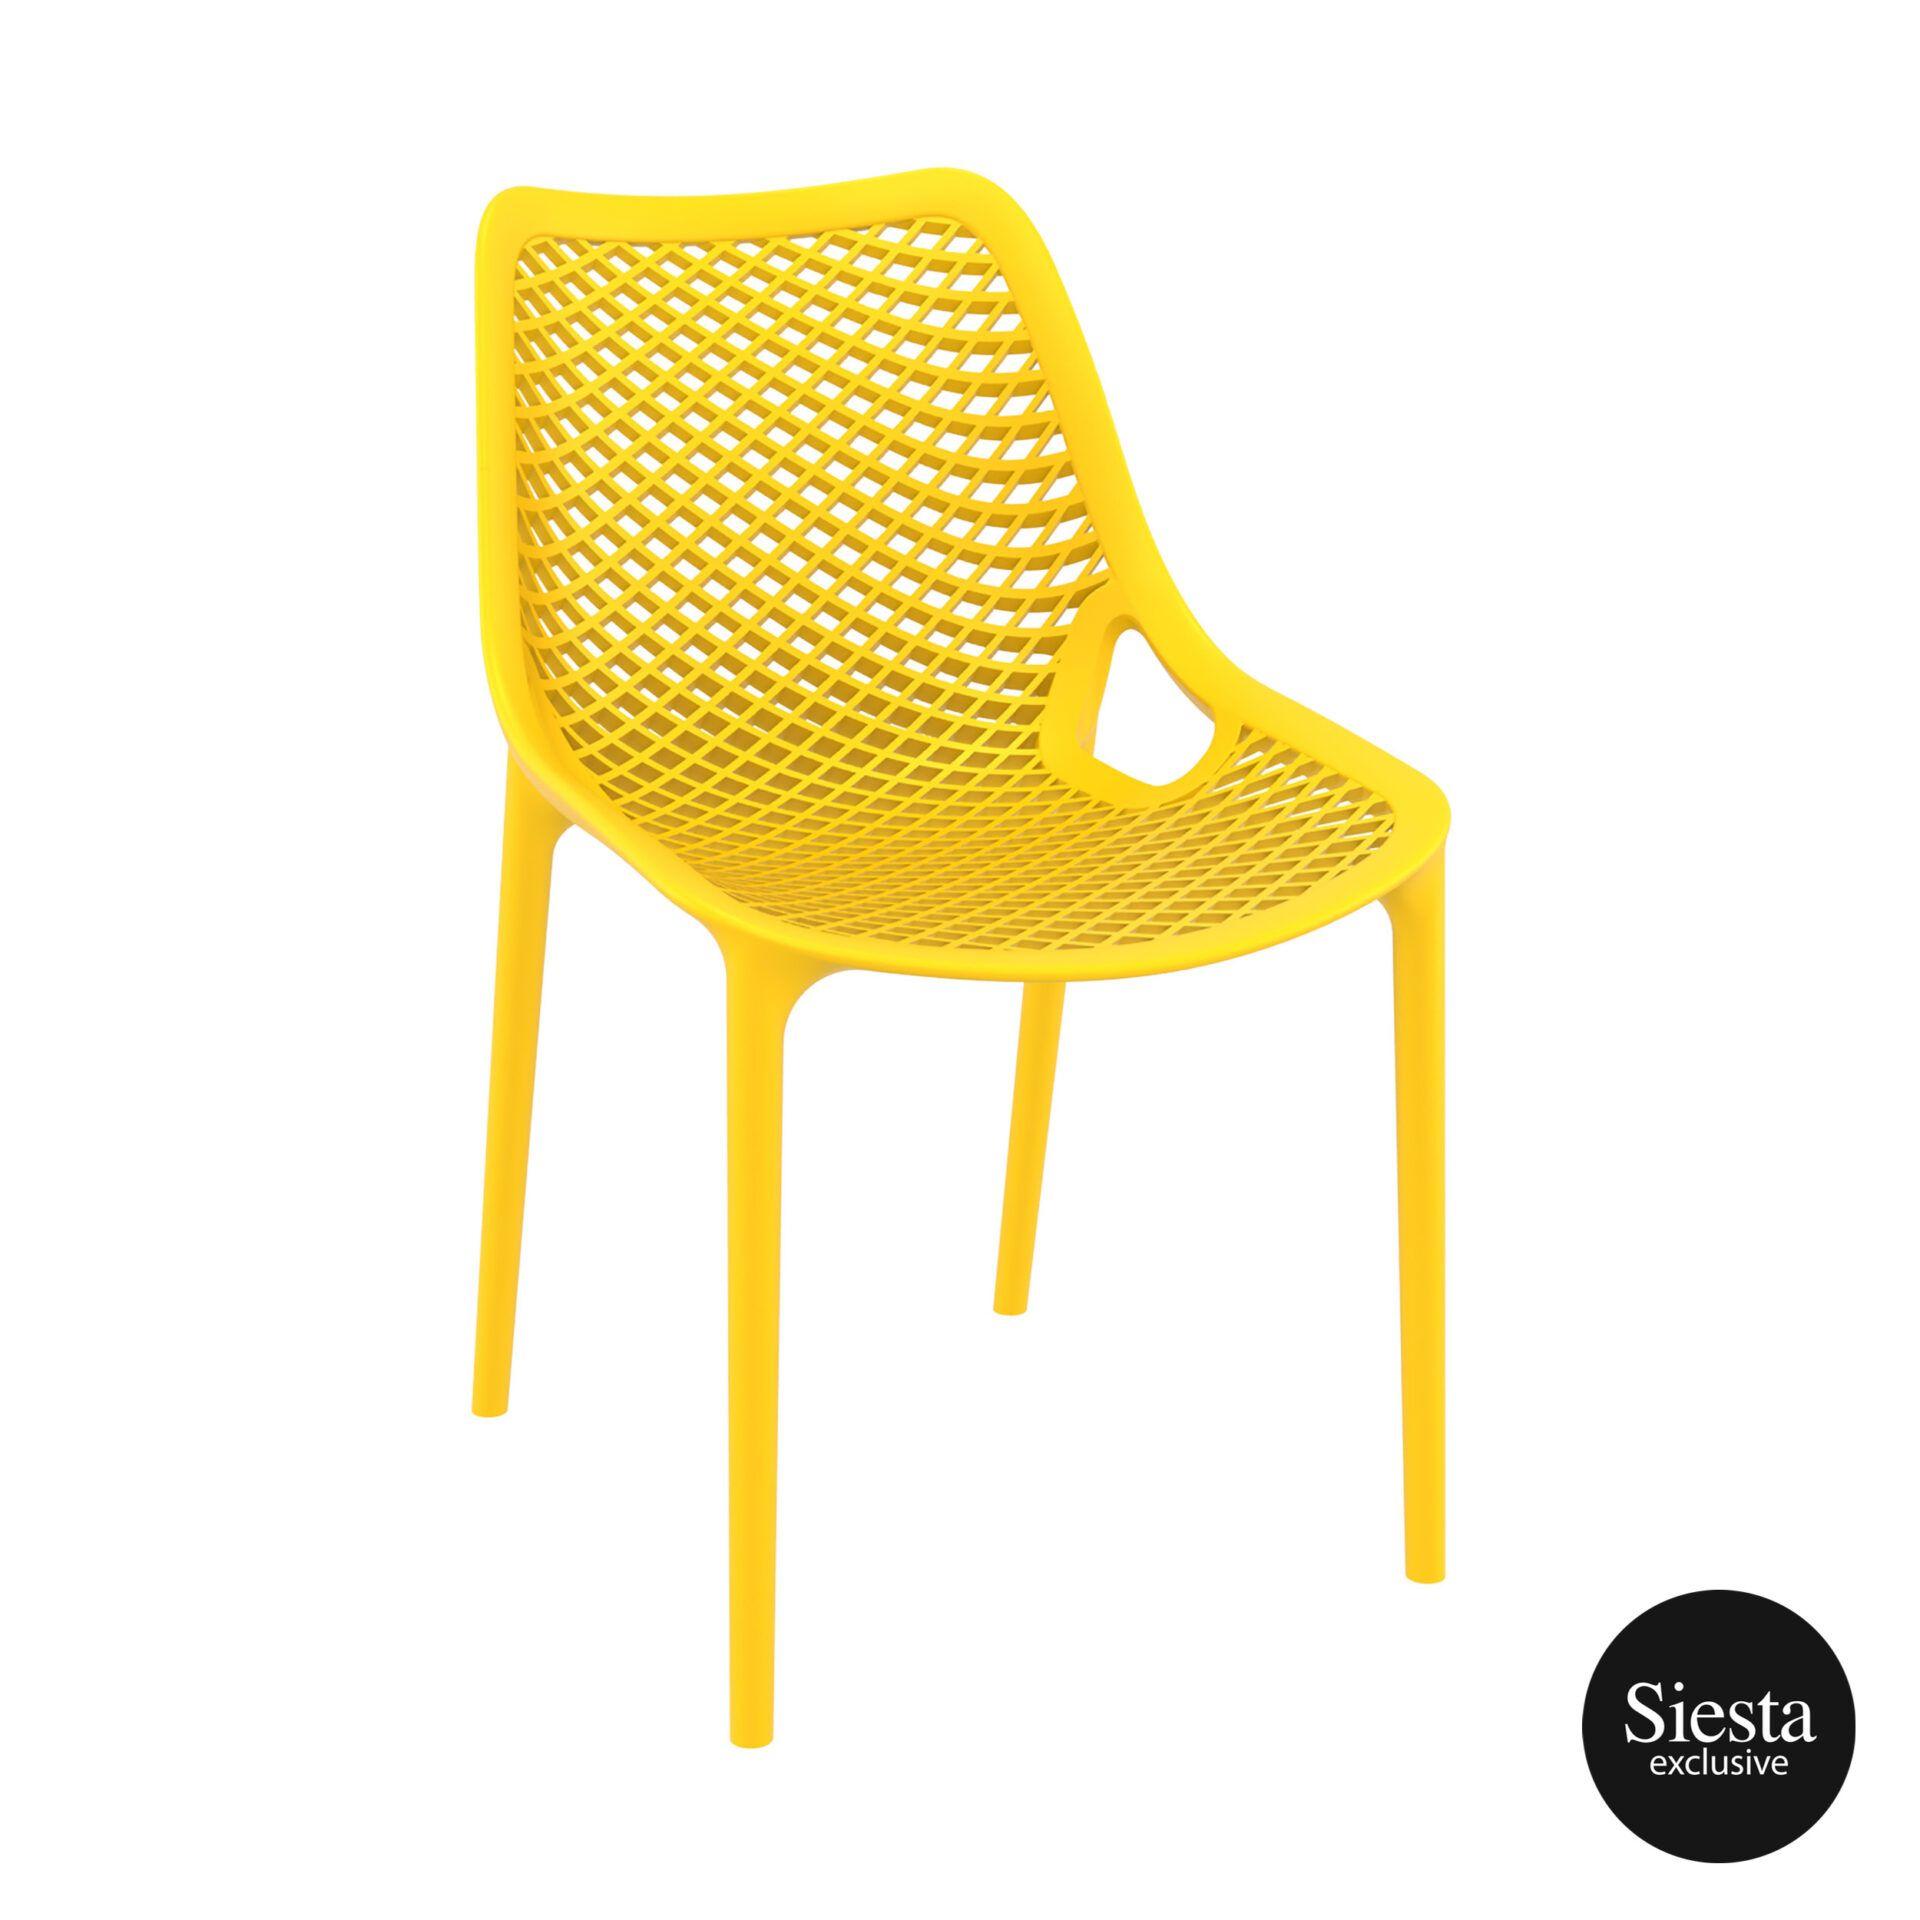 original siesta air chair yellow front side 1